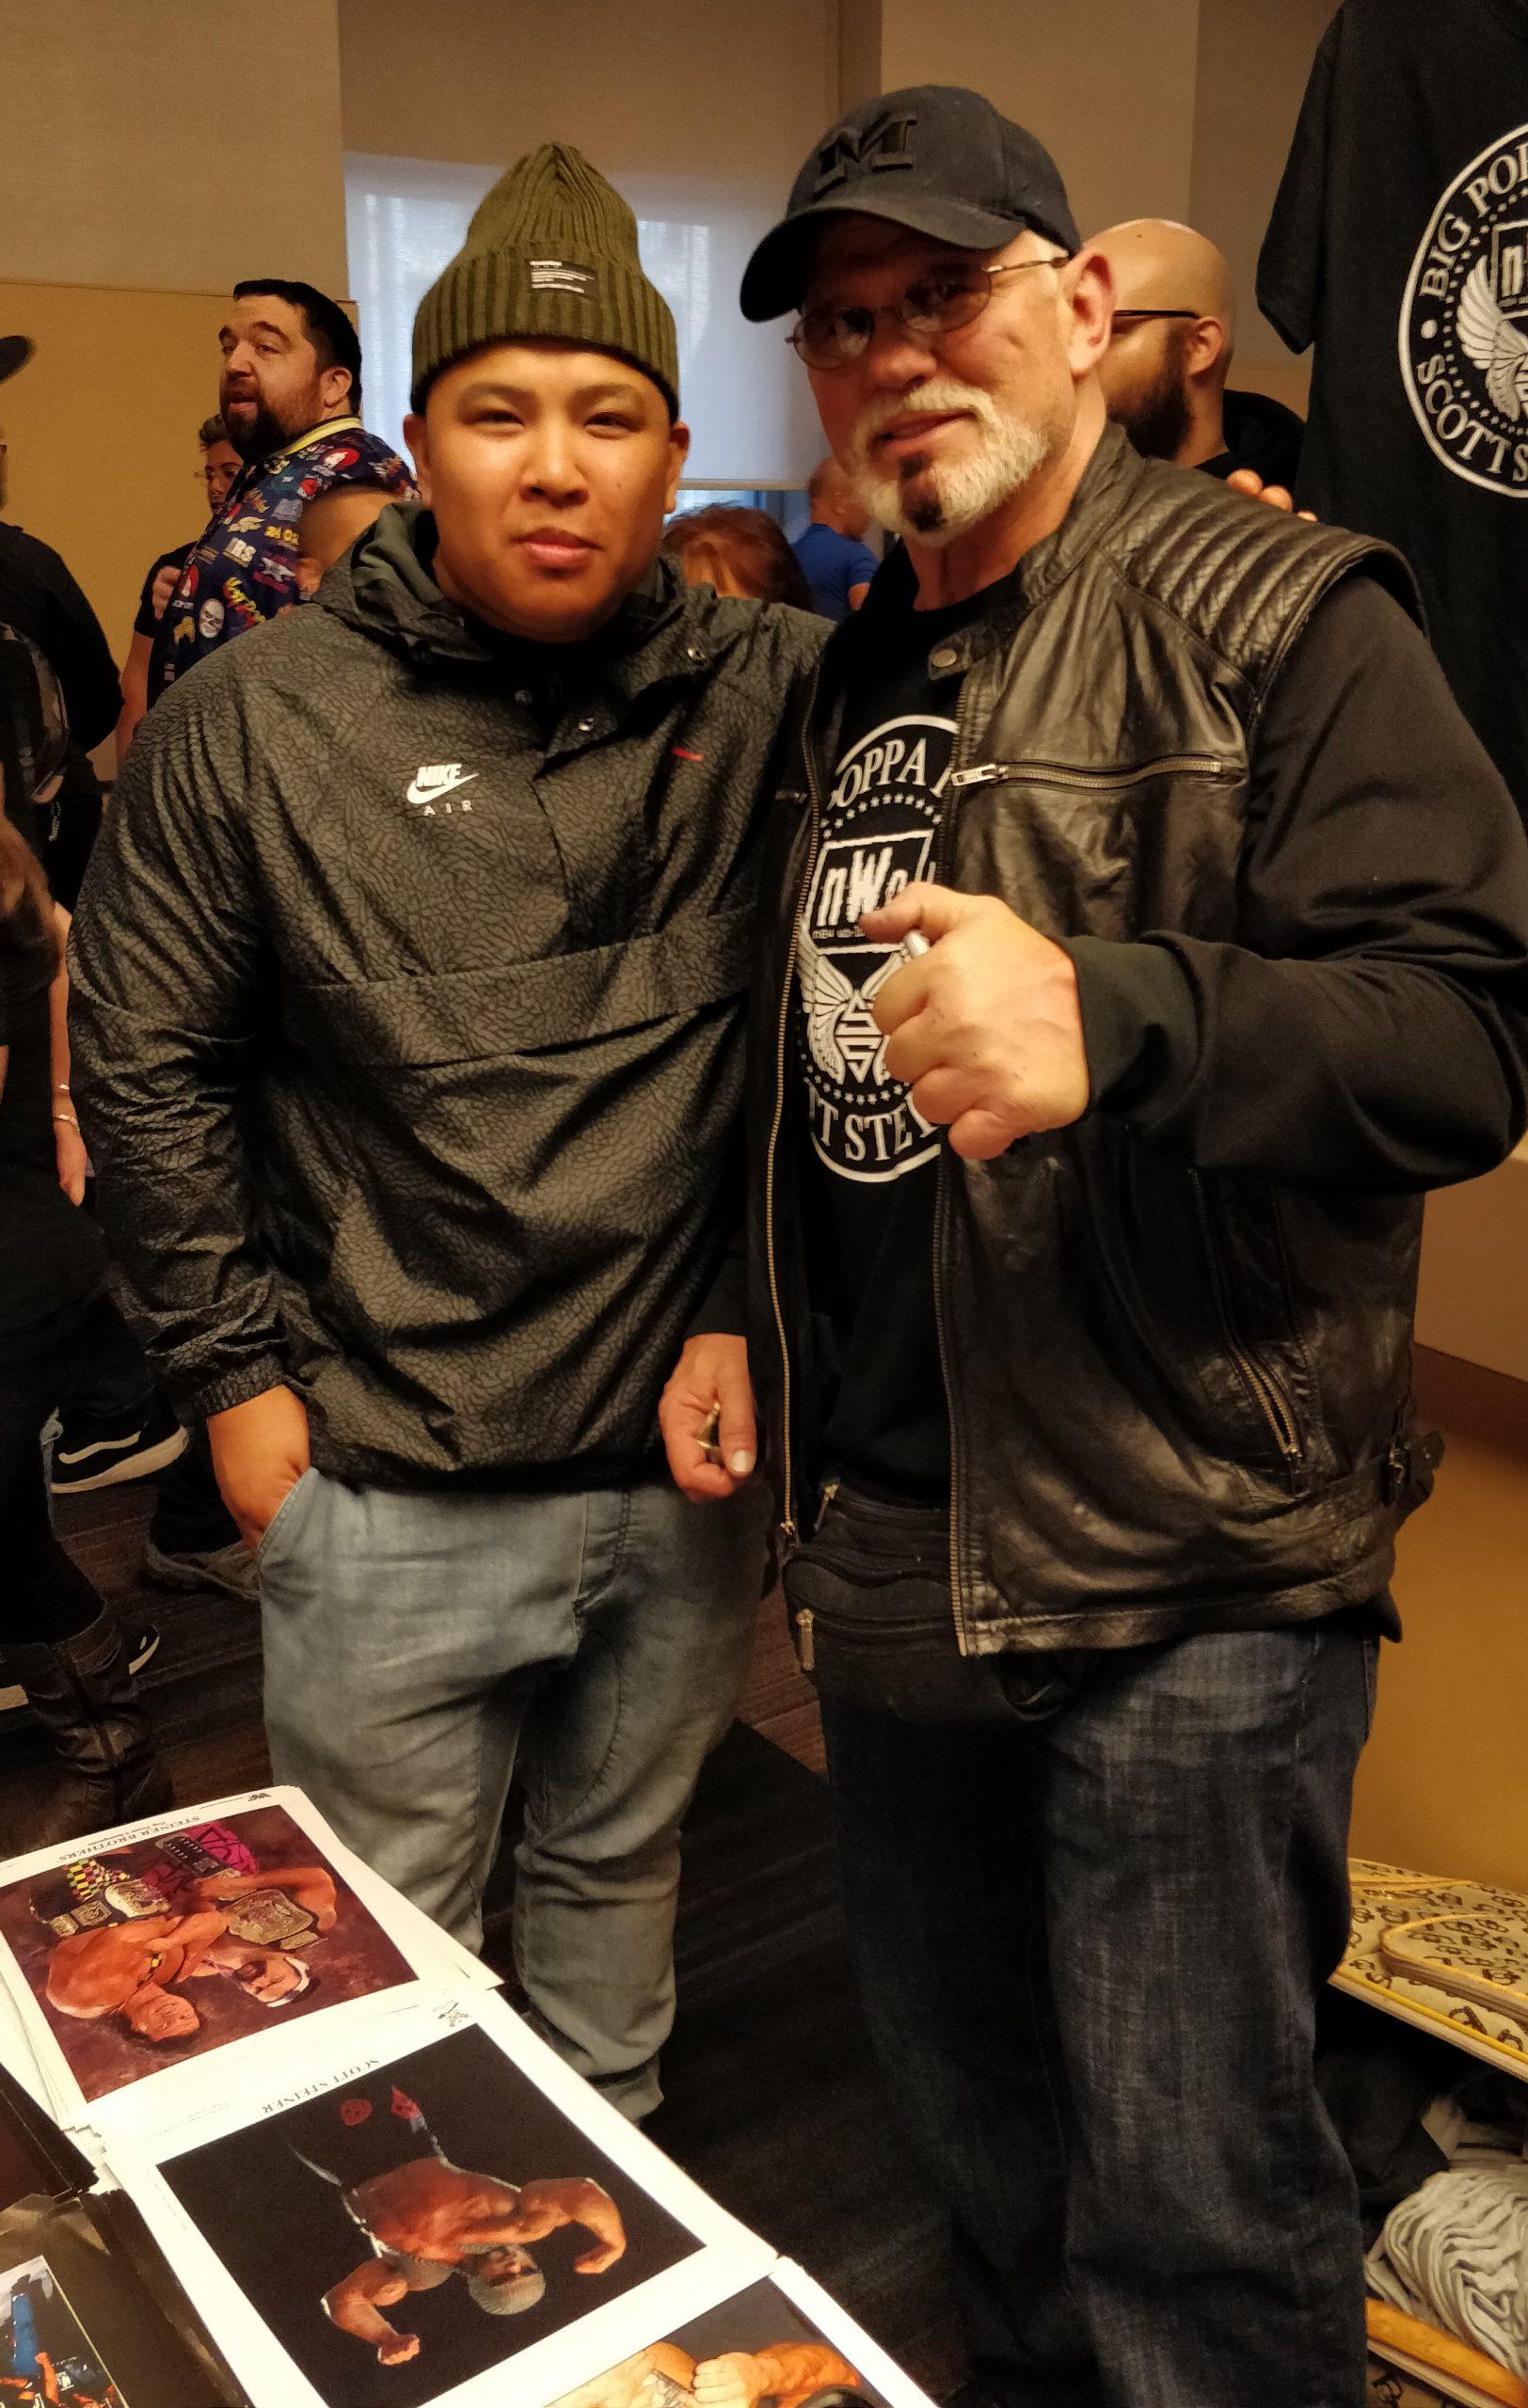 Wayne Lapasa with Scott Steiner at WrestleCon New York